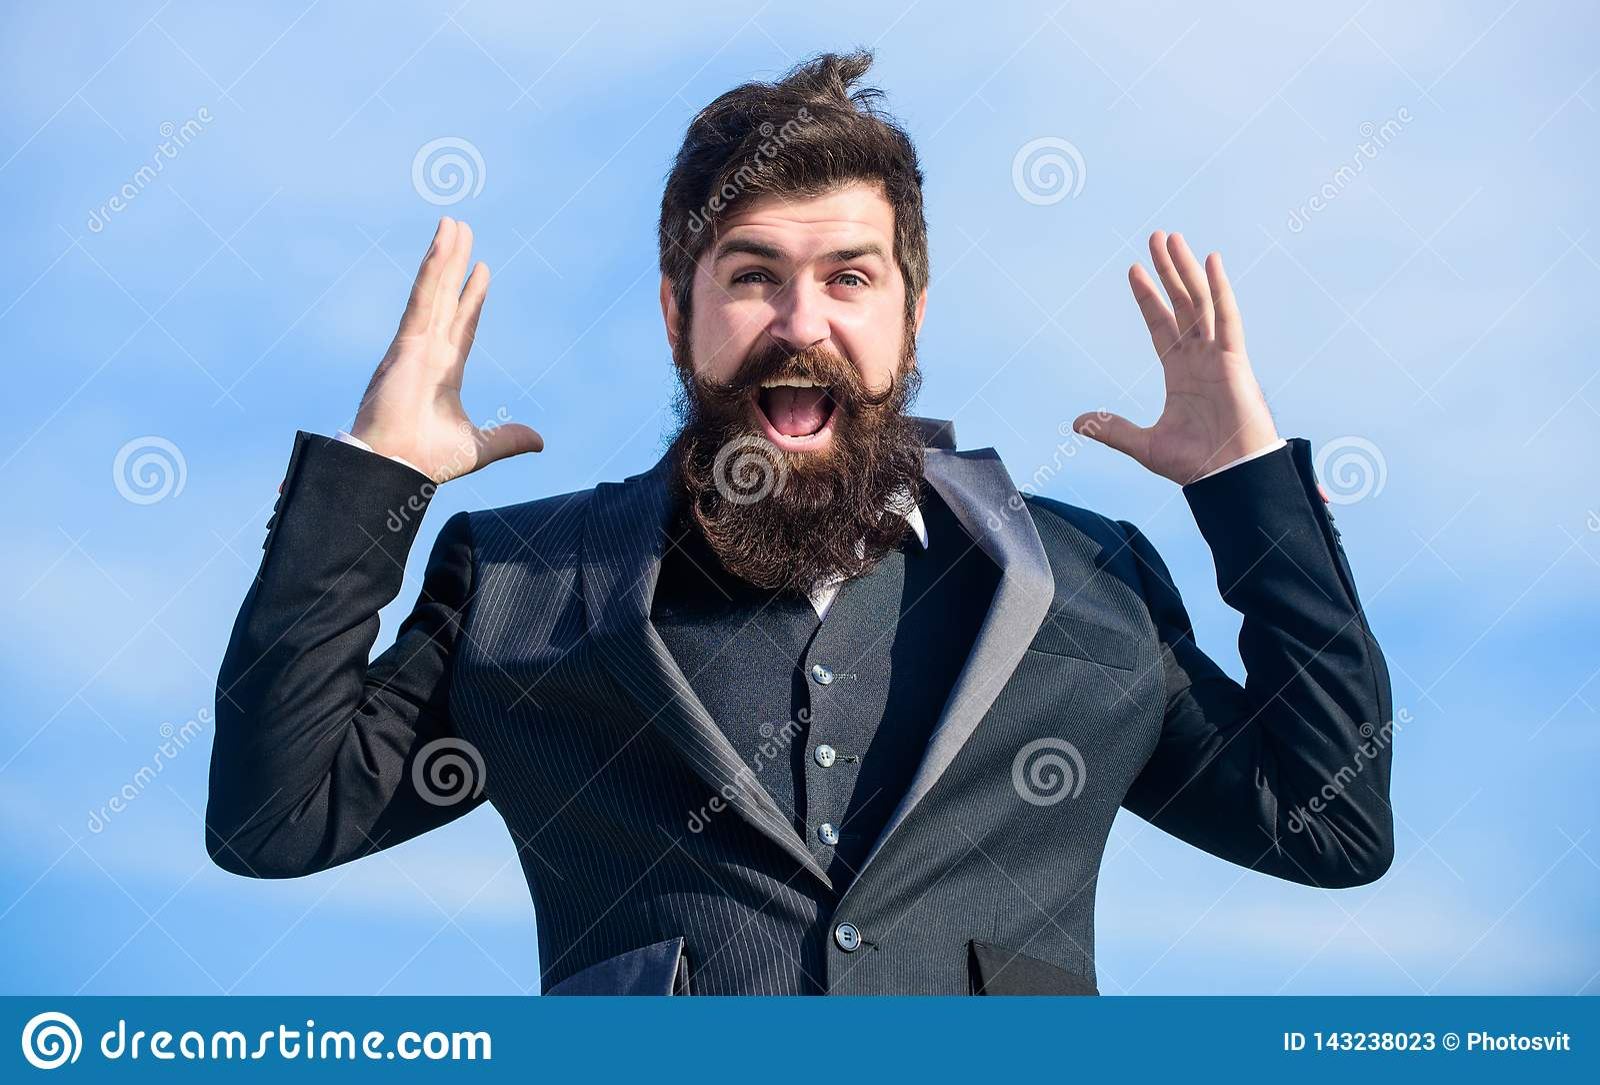 Бизнесмен человека бородатый оптимистический нести официальную предпосылку неба костюма Успех и везение Оптимистическое настроени